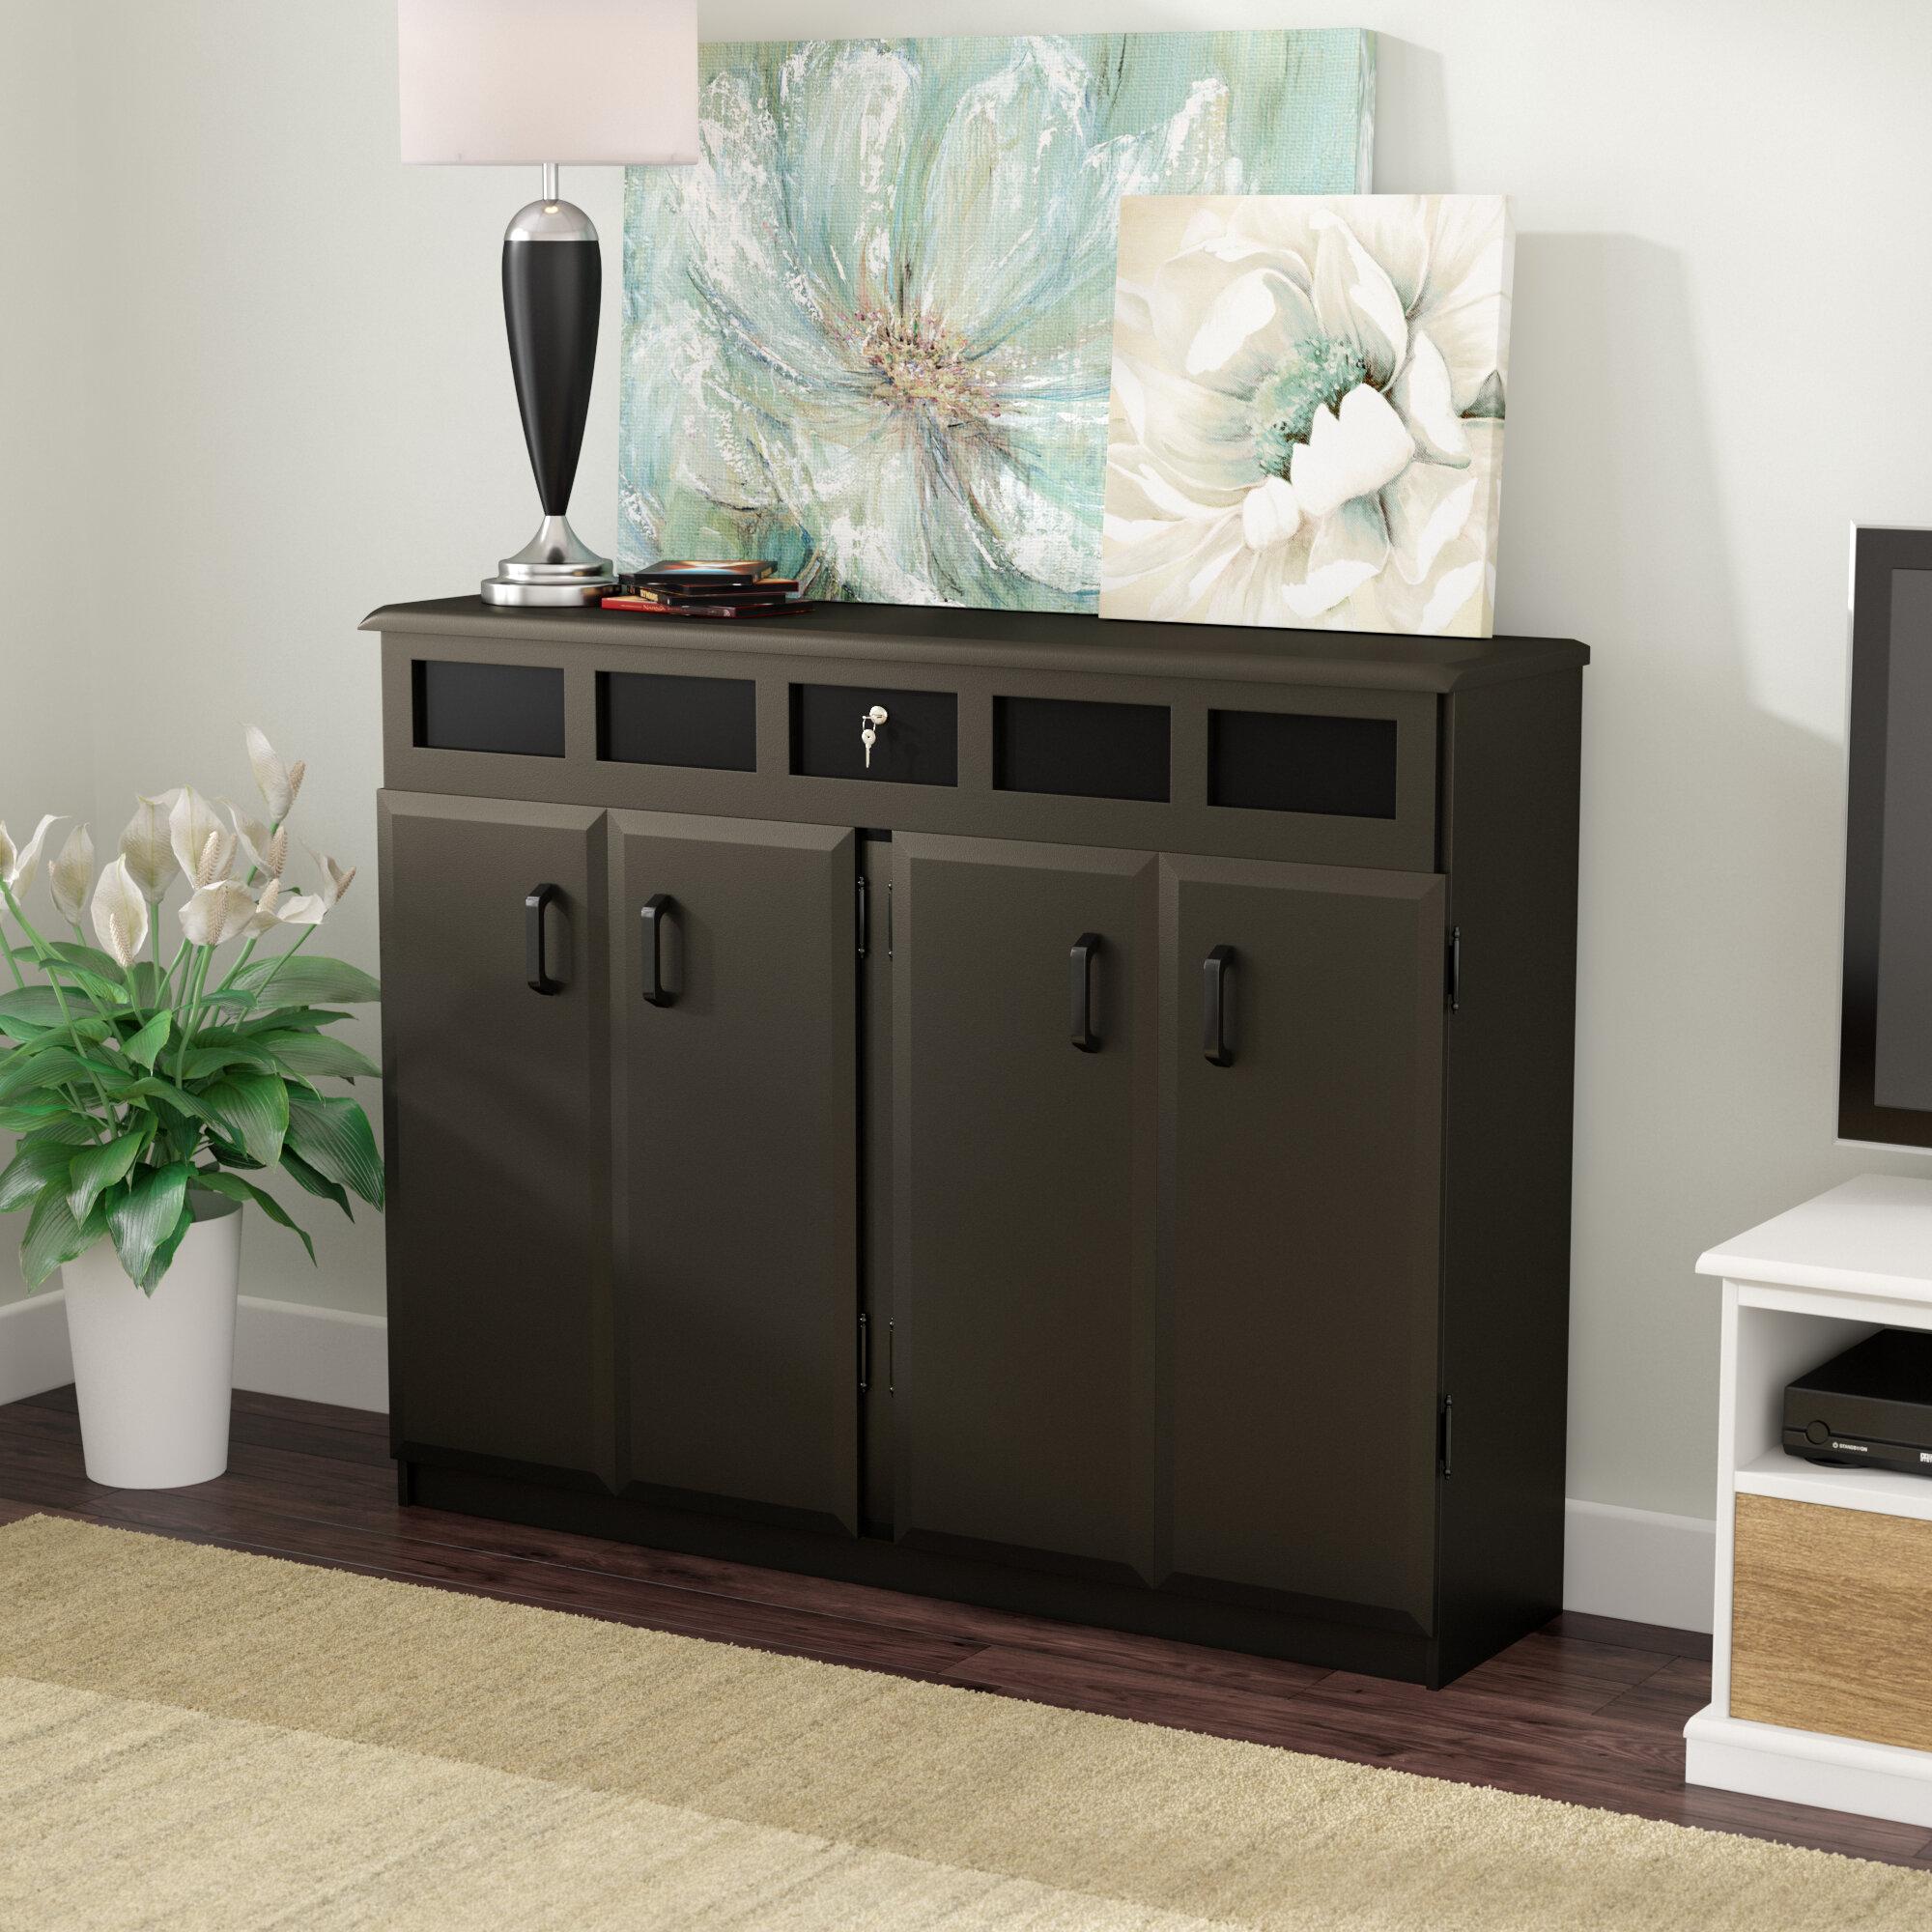 designs select peaceful inspiration merry entertainment reviews sauder wayfair cabinet warm hokku media ideas center